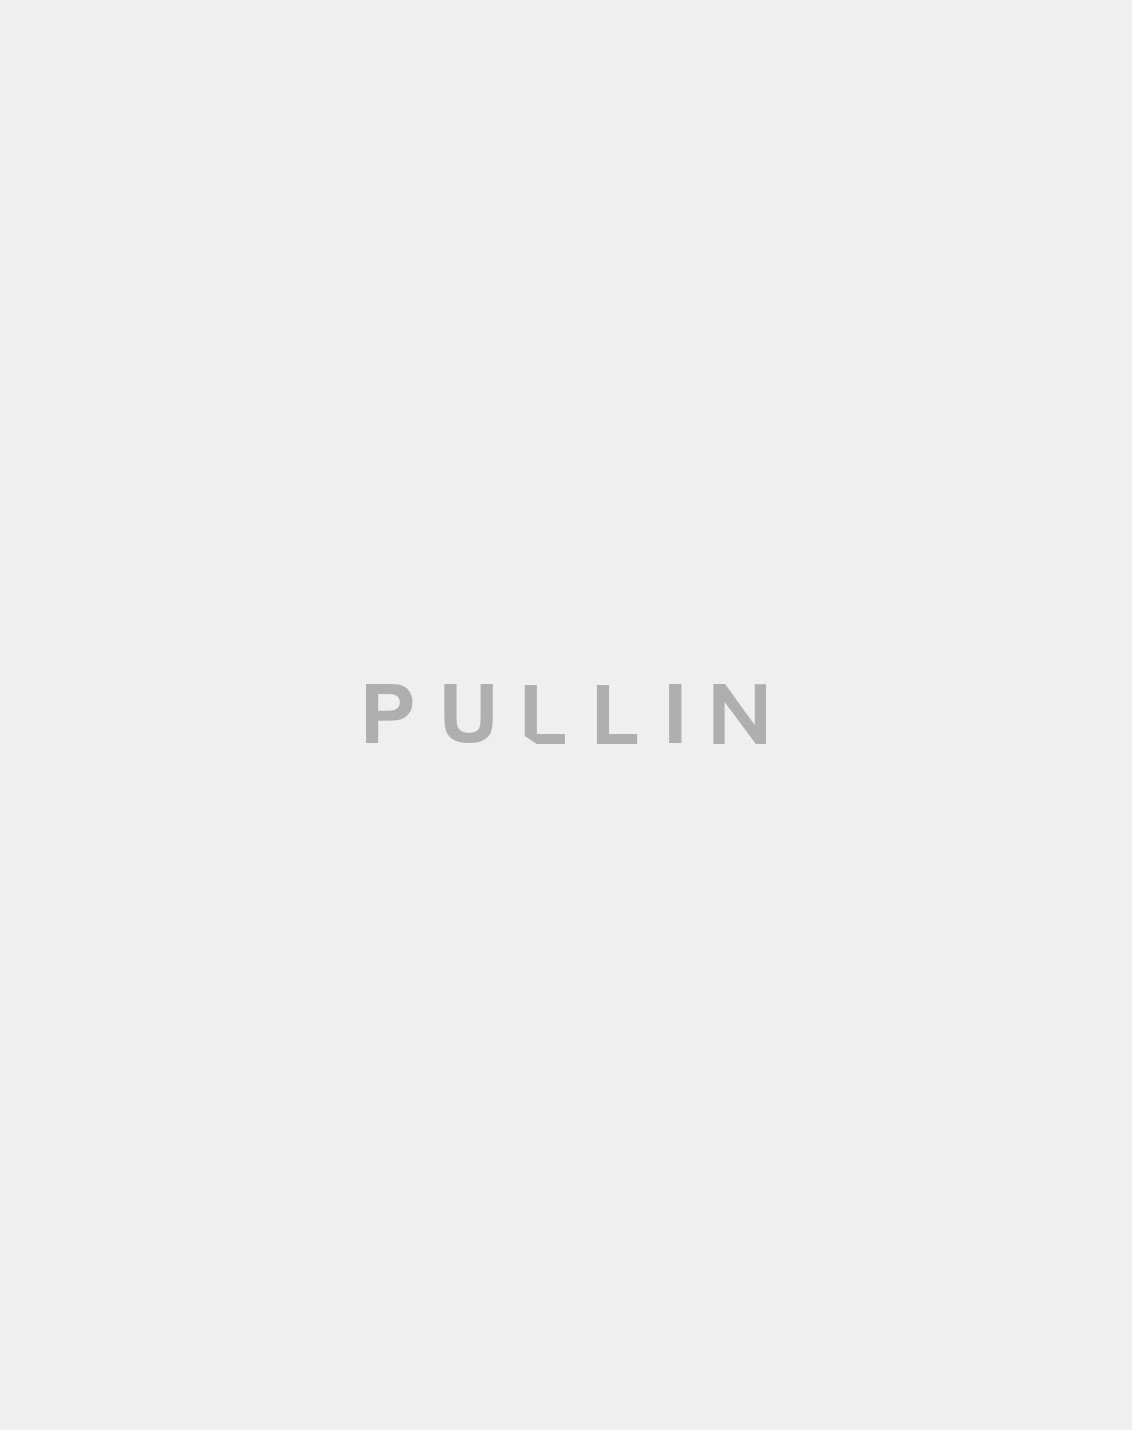 T-shirt cornelius homme - pull in 1